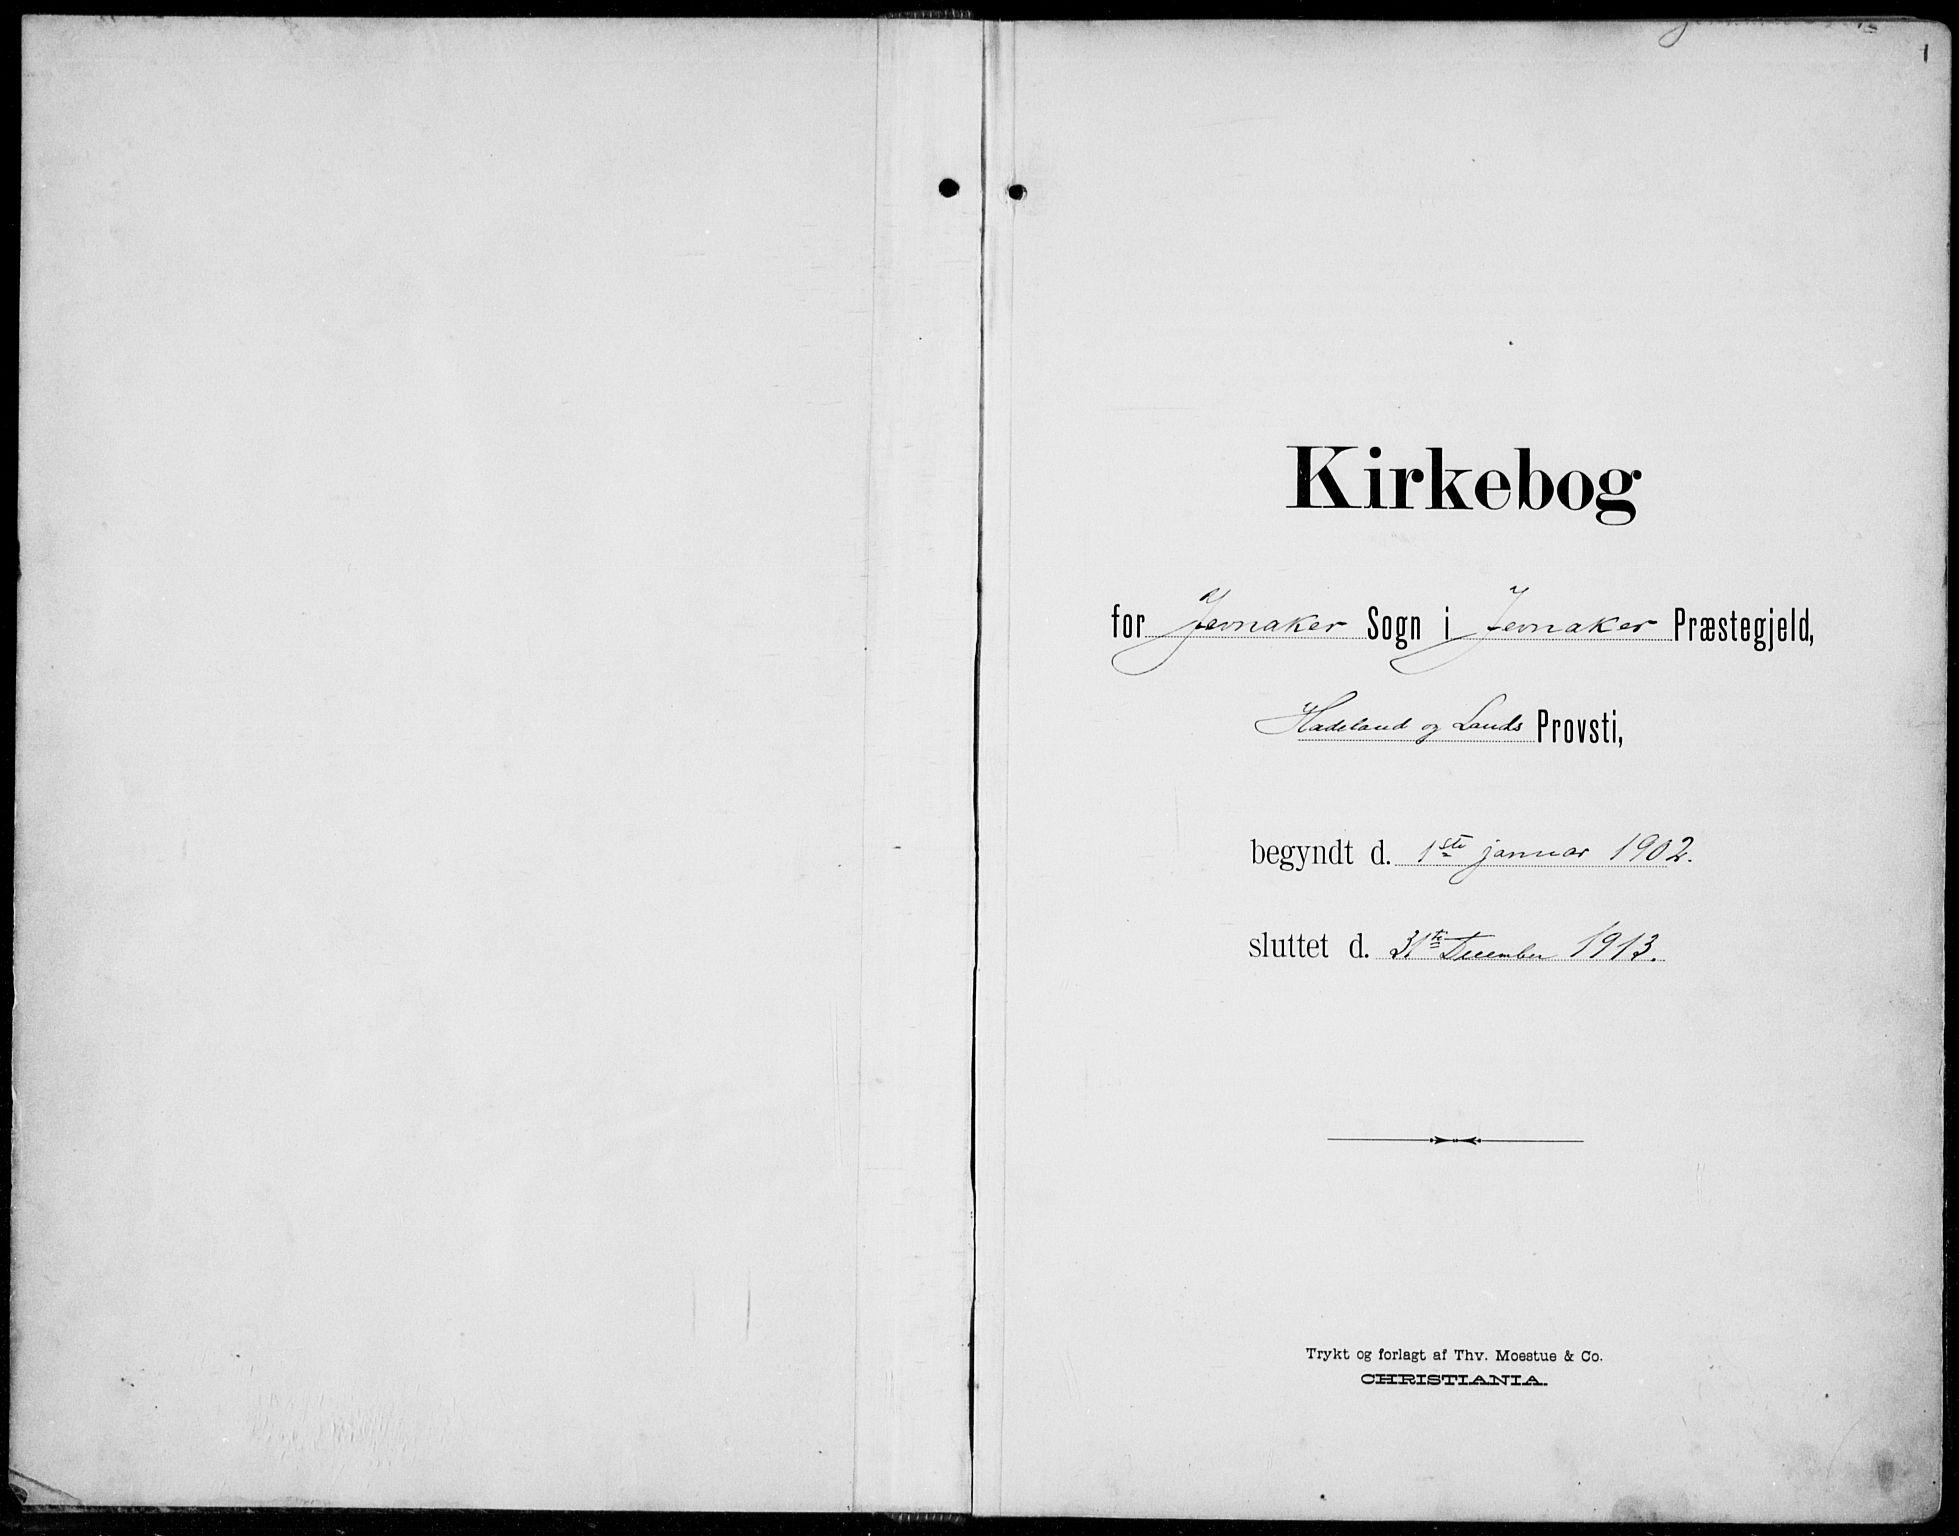 SAH, Jevnaker prestekontor, Ministerialbok nr. 11, 1902-1913, s. 1